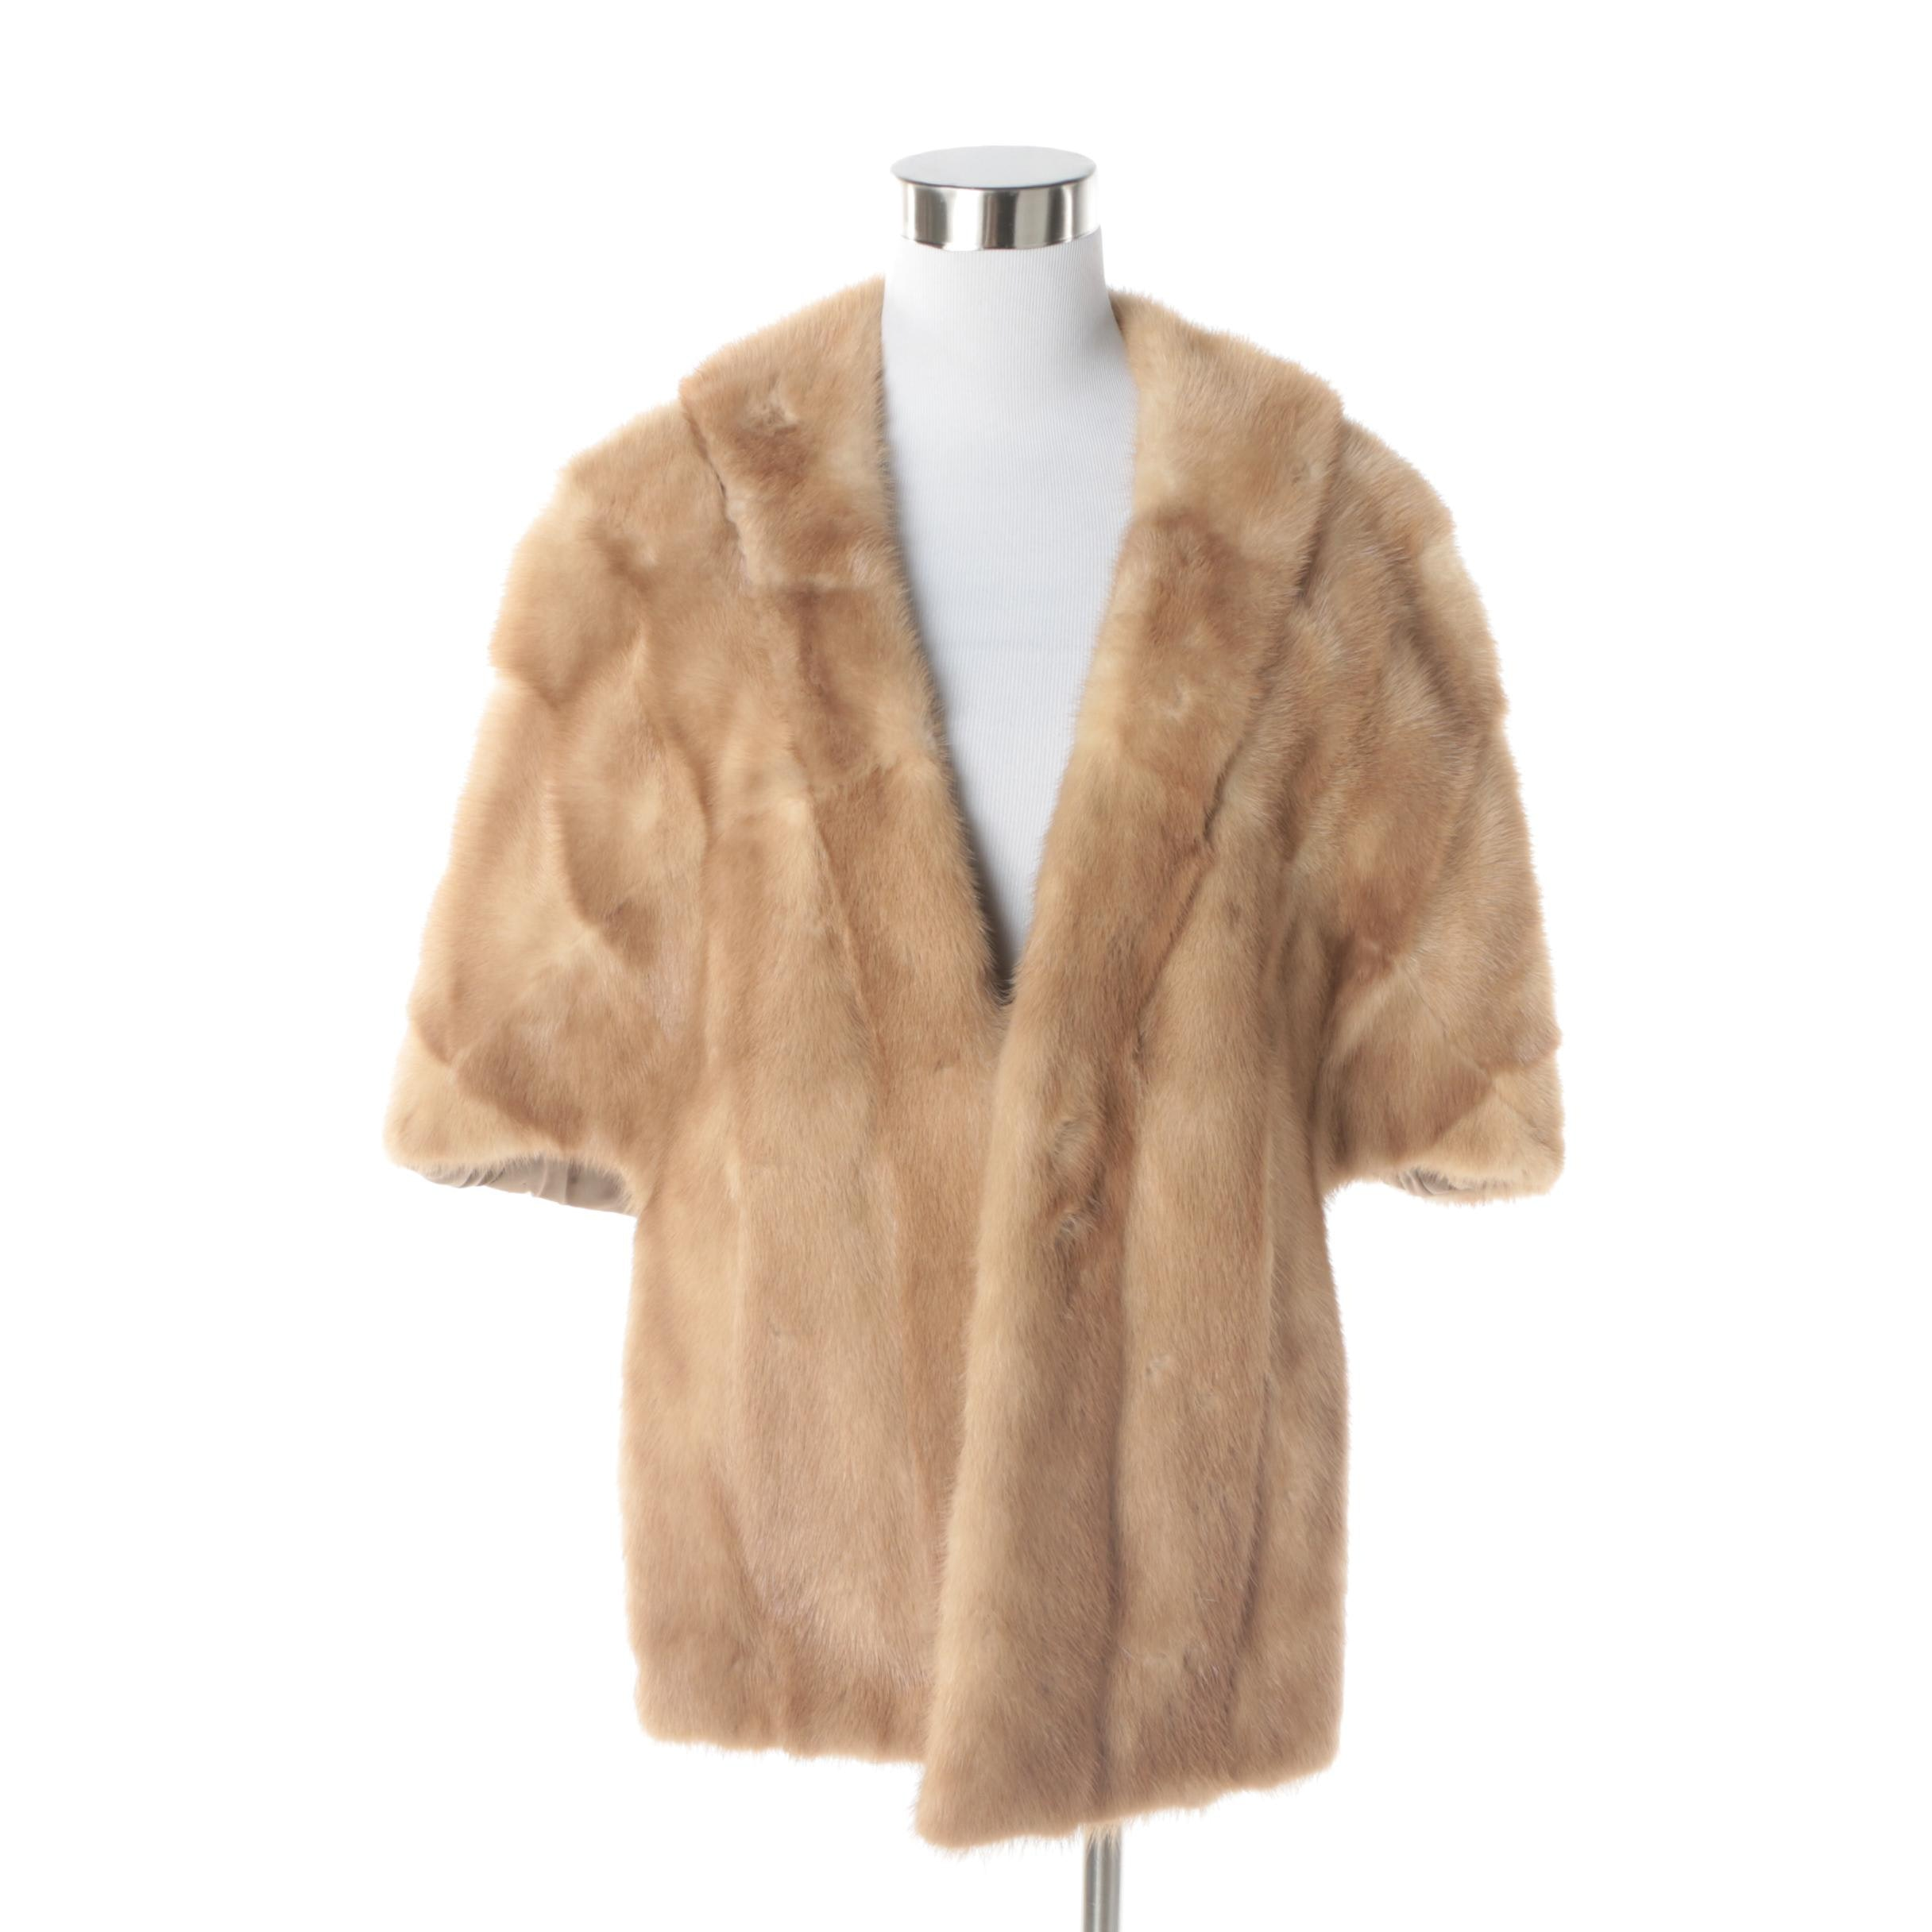 Women's Vintage Blonde Mink Fur Stole